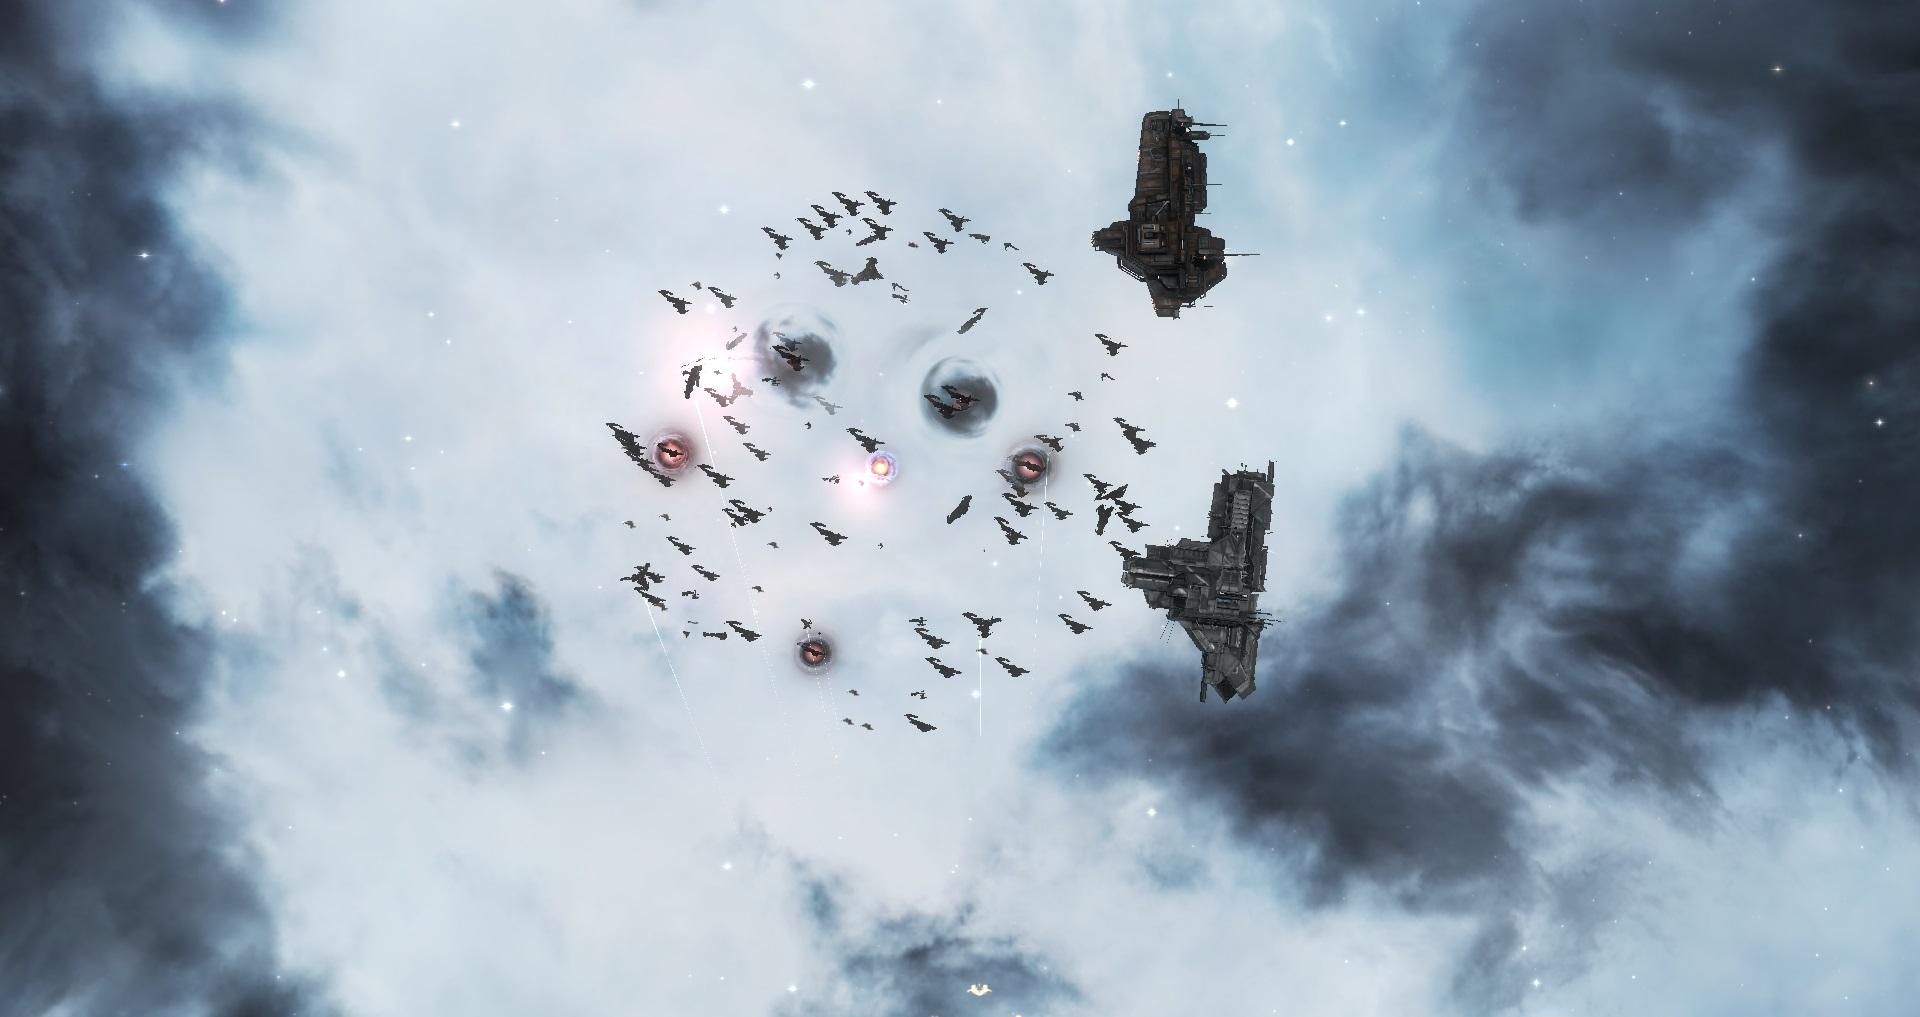 Snuffed Out\Project.Mayhem. Rattlesnake Fleet Bridging into Oijanen